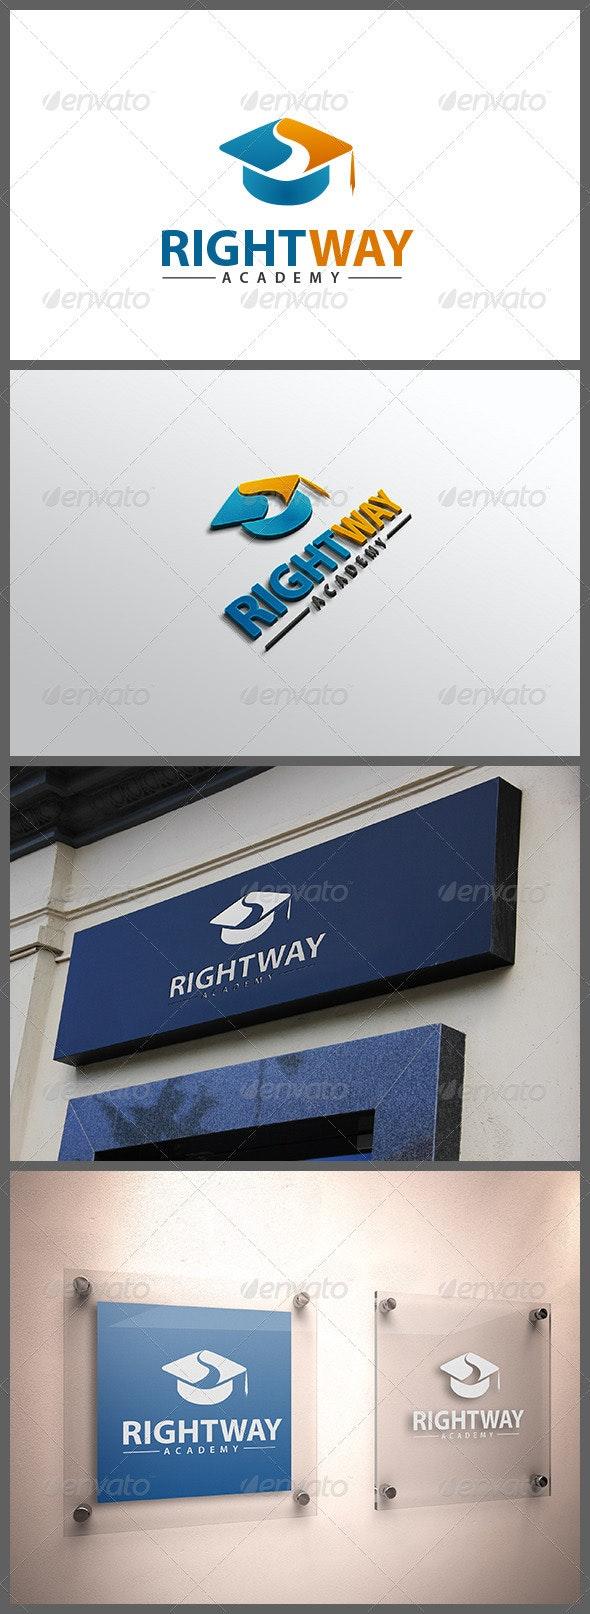 Right Way Academy - Objects Logo Templates